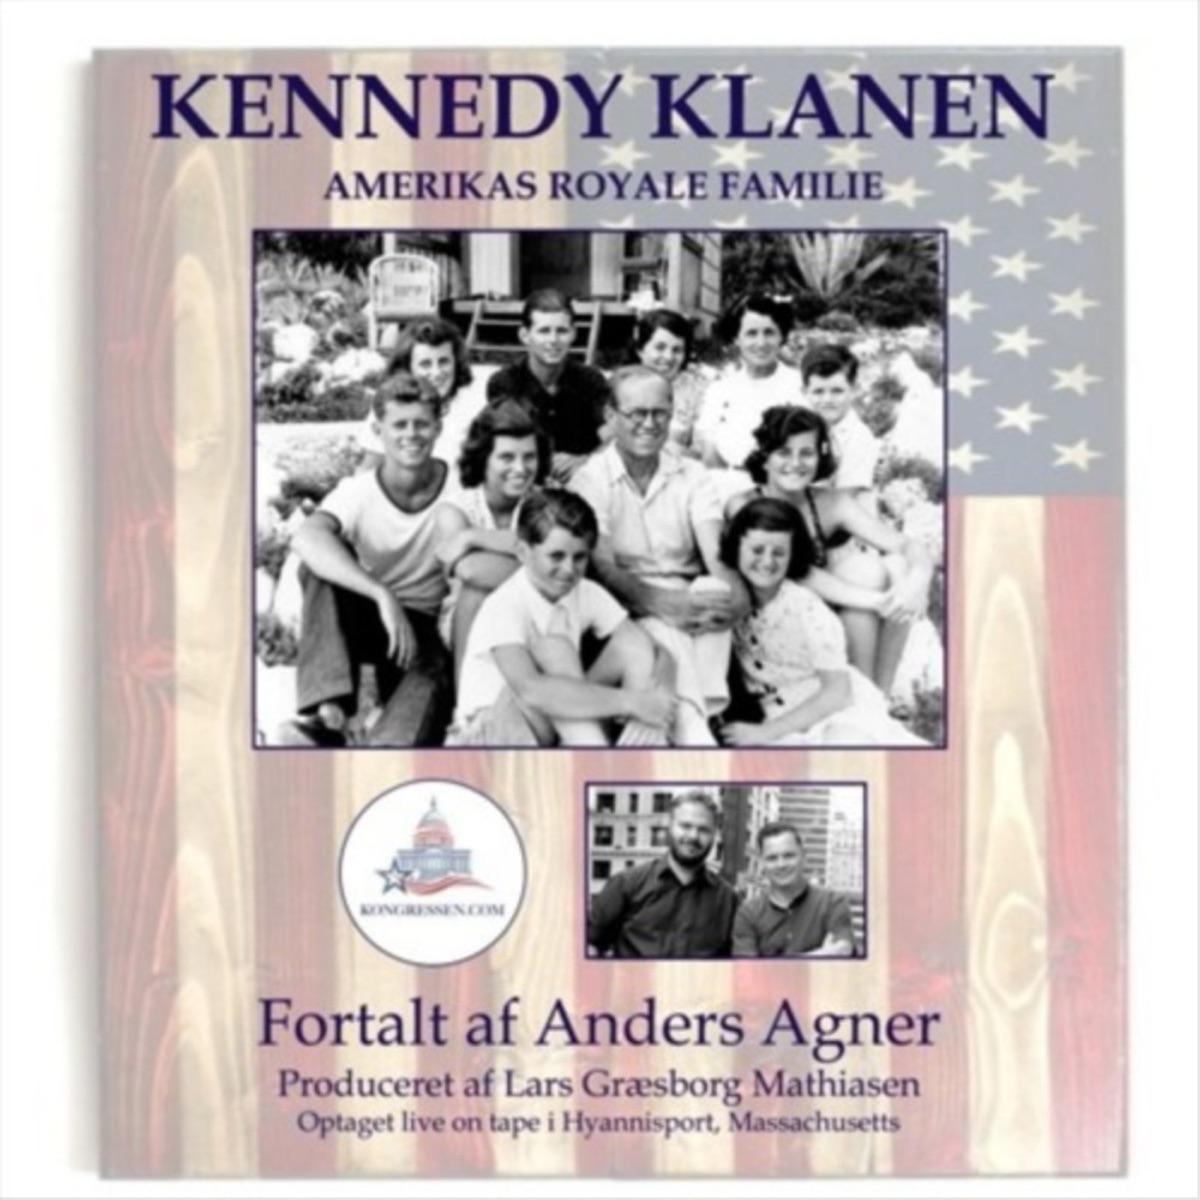 Kennedy-klanen: Amerikas royale familie